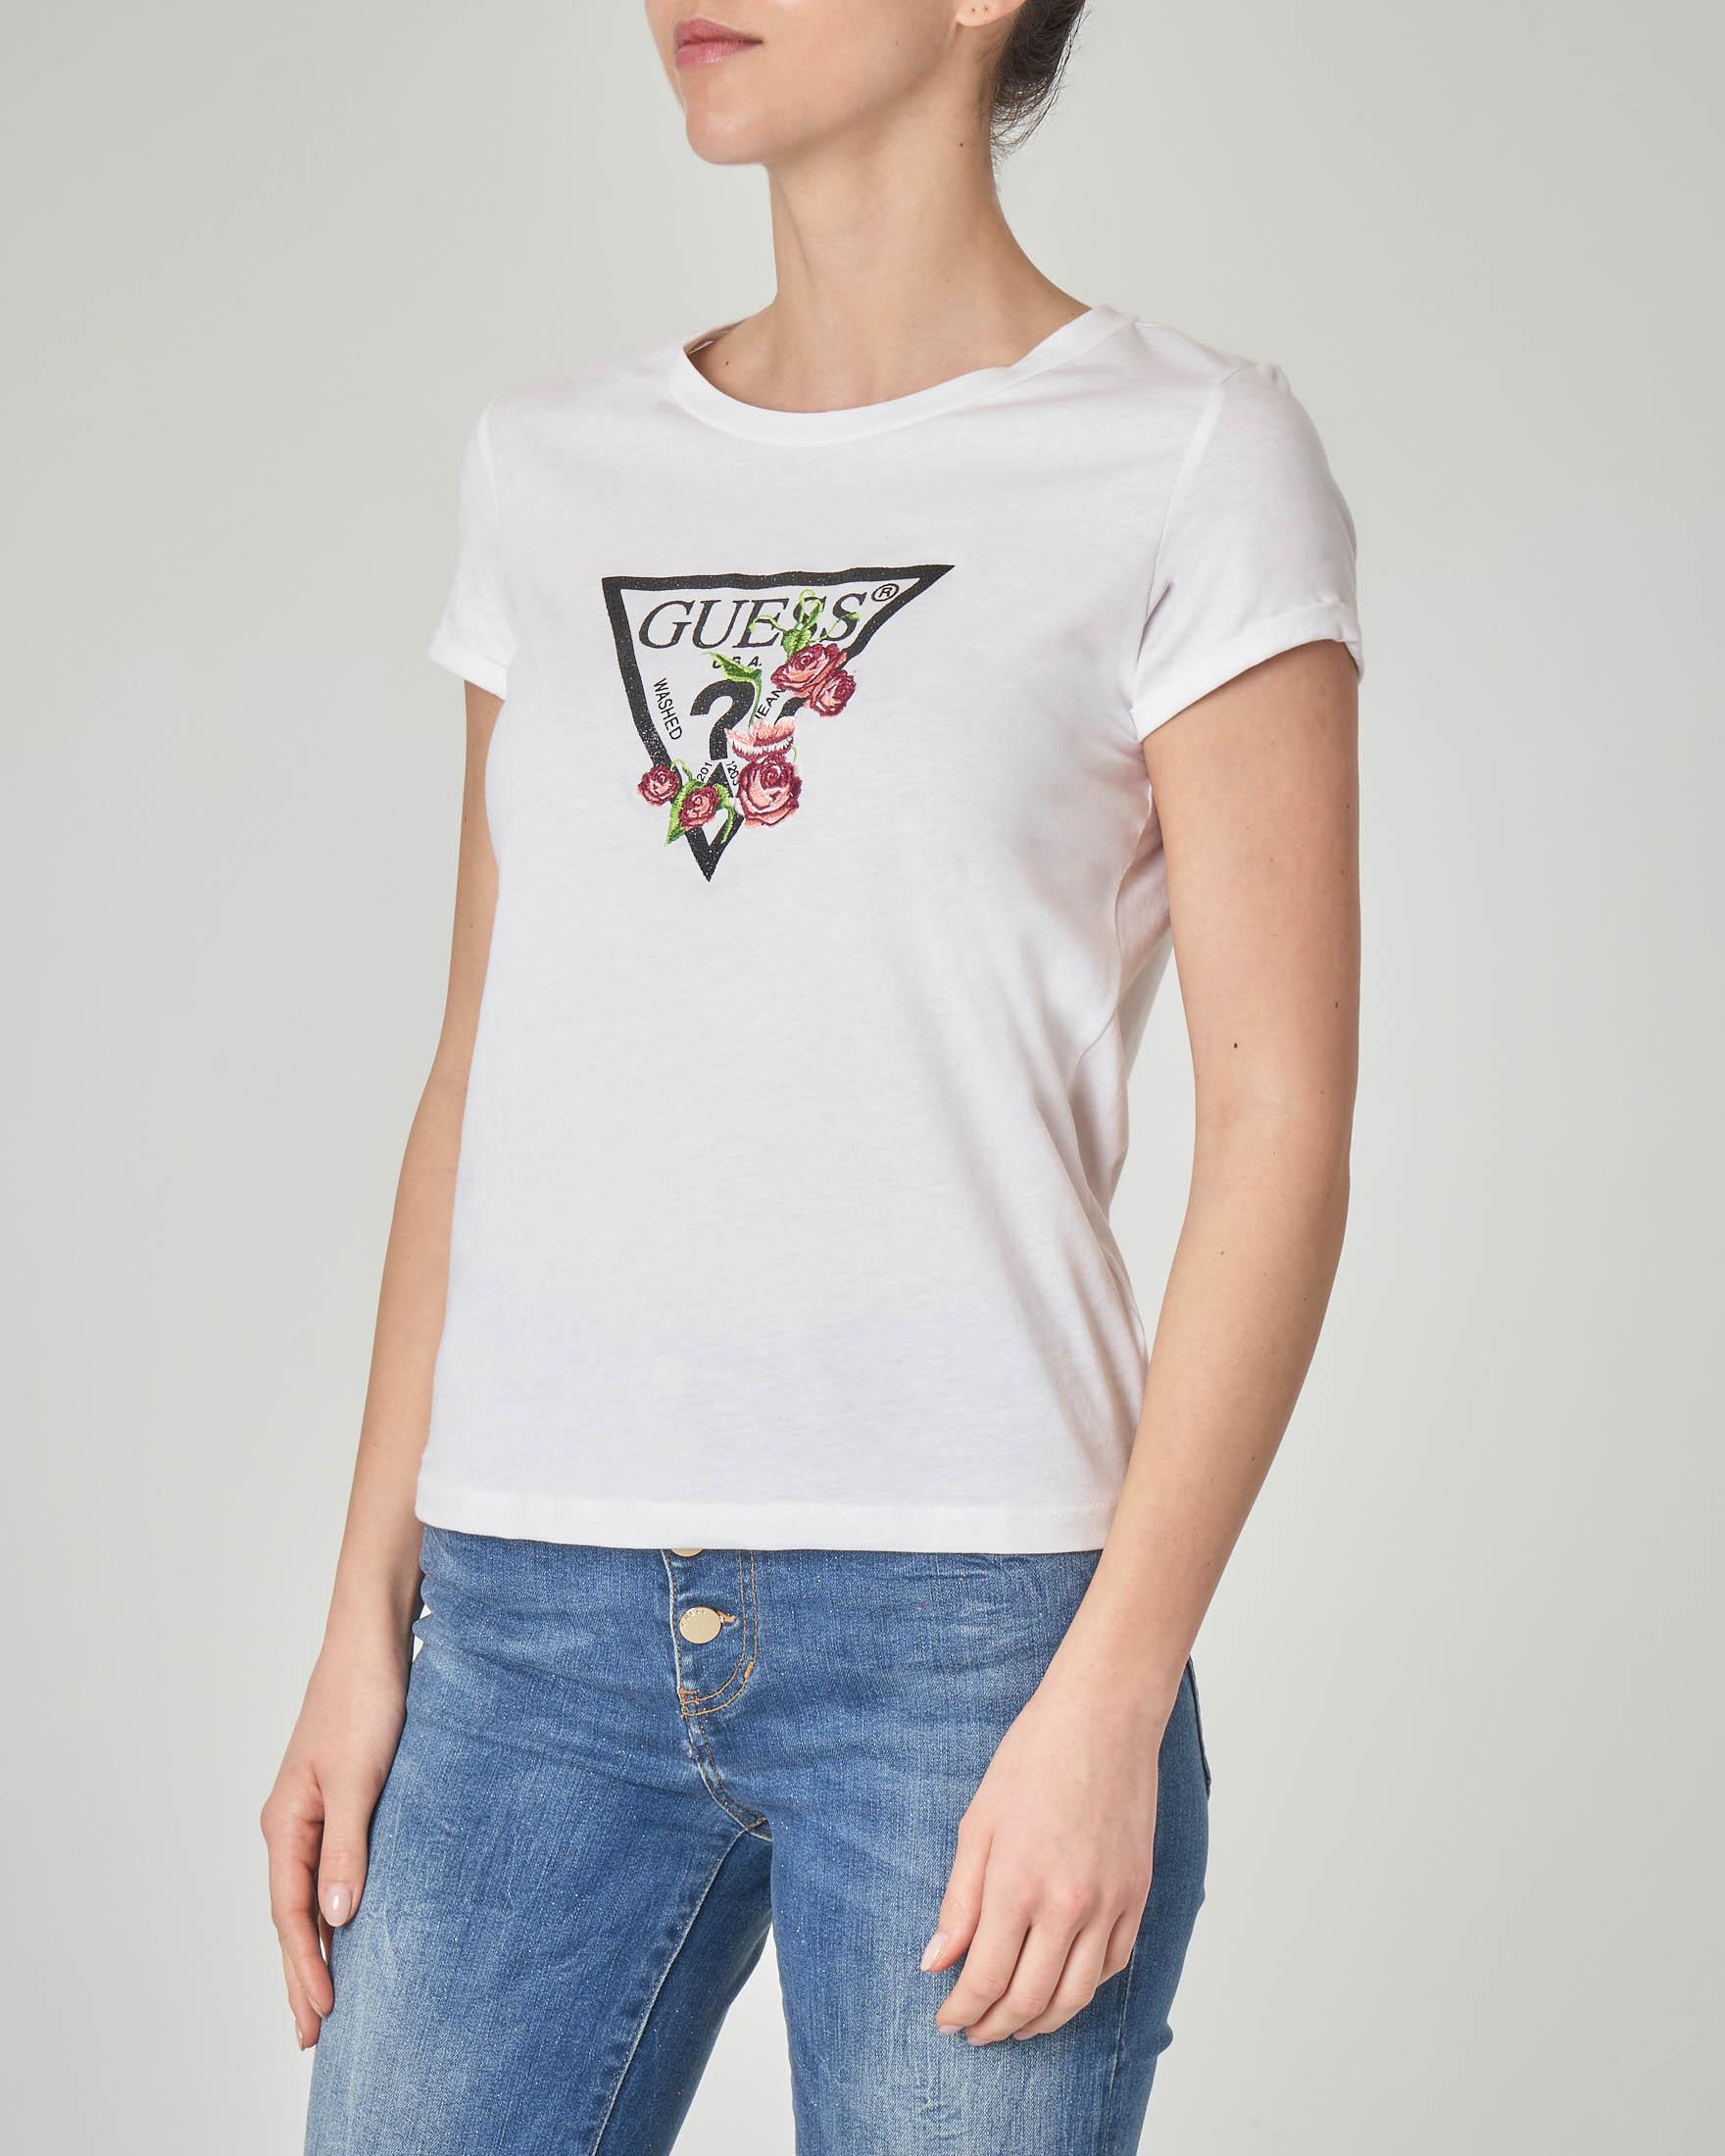 T-shirt biacna in cotone con logo in lurex e ricamo